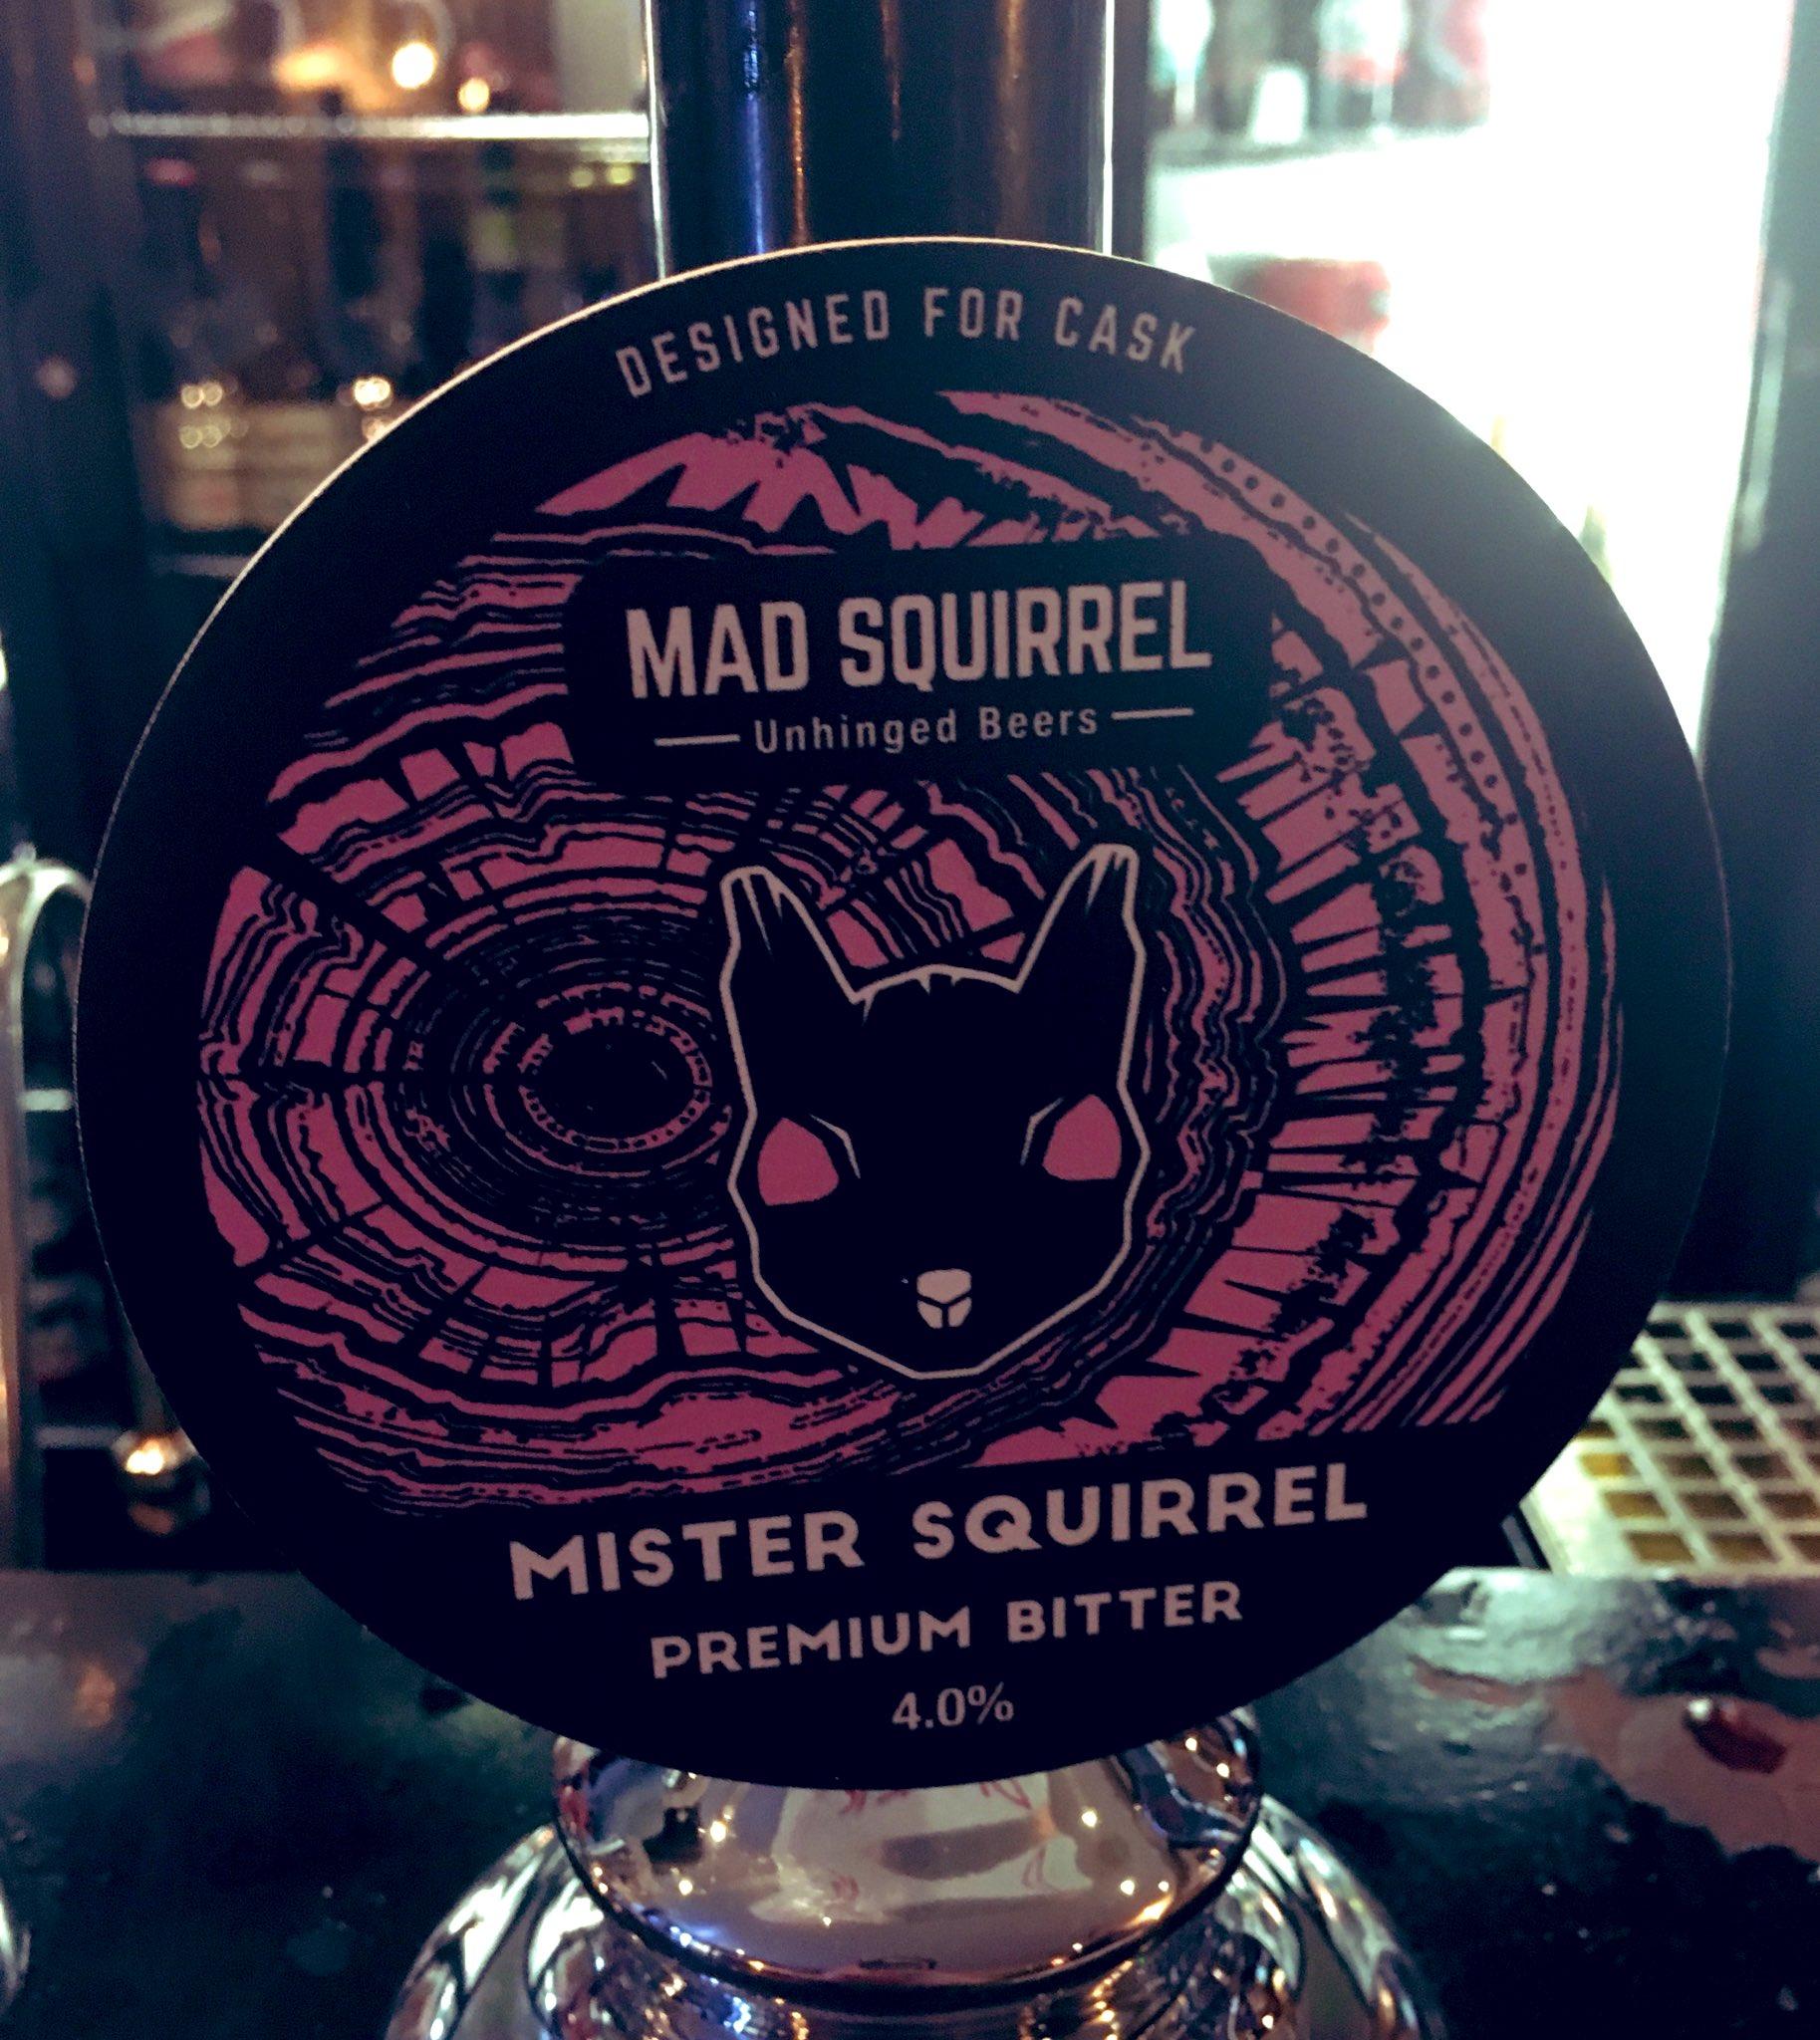 89: Mister Squirrel